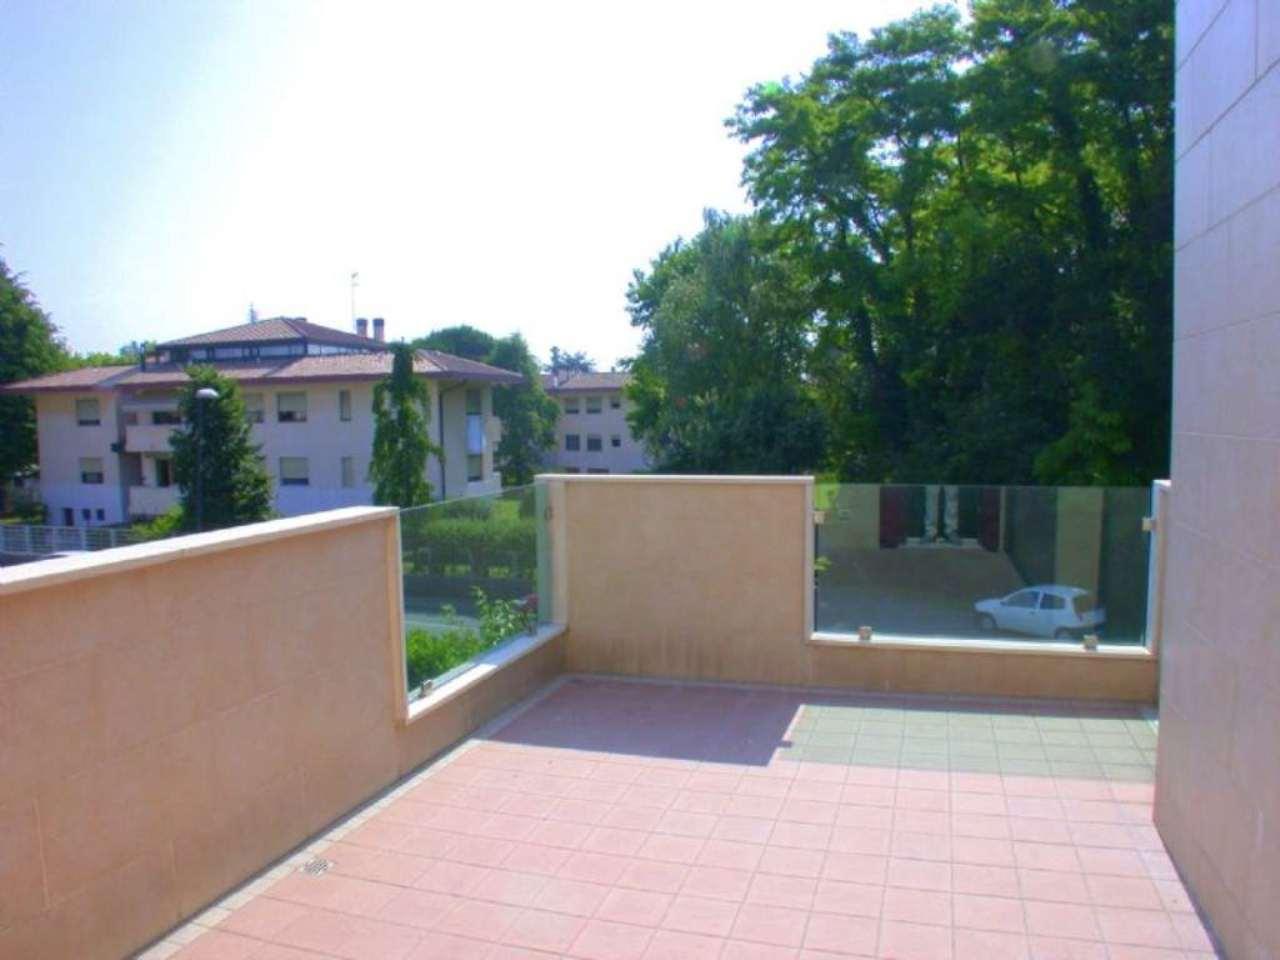 Bilocale Treviso Via Ugo Bassi 1